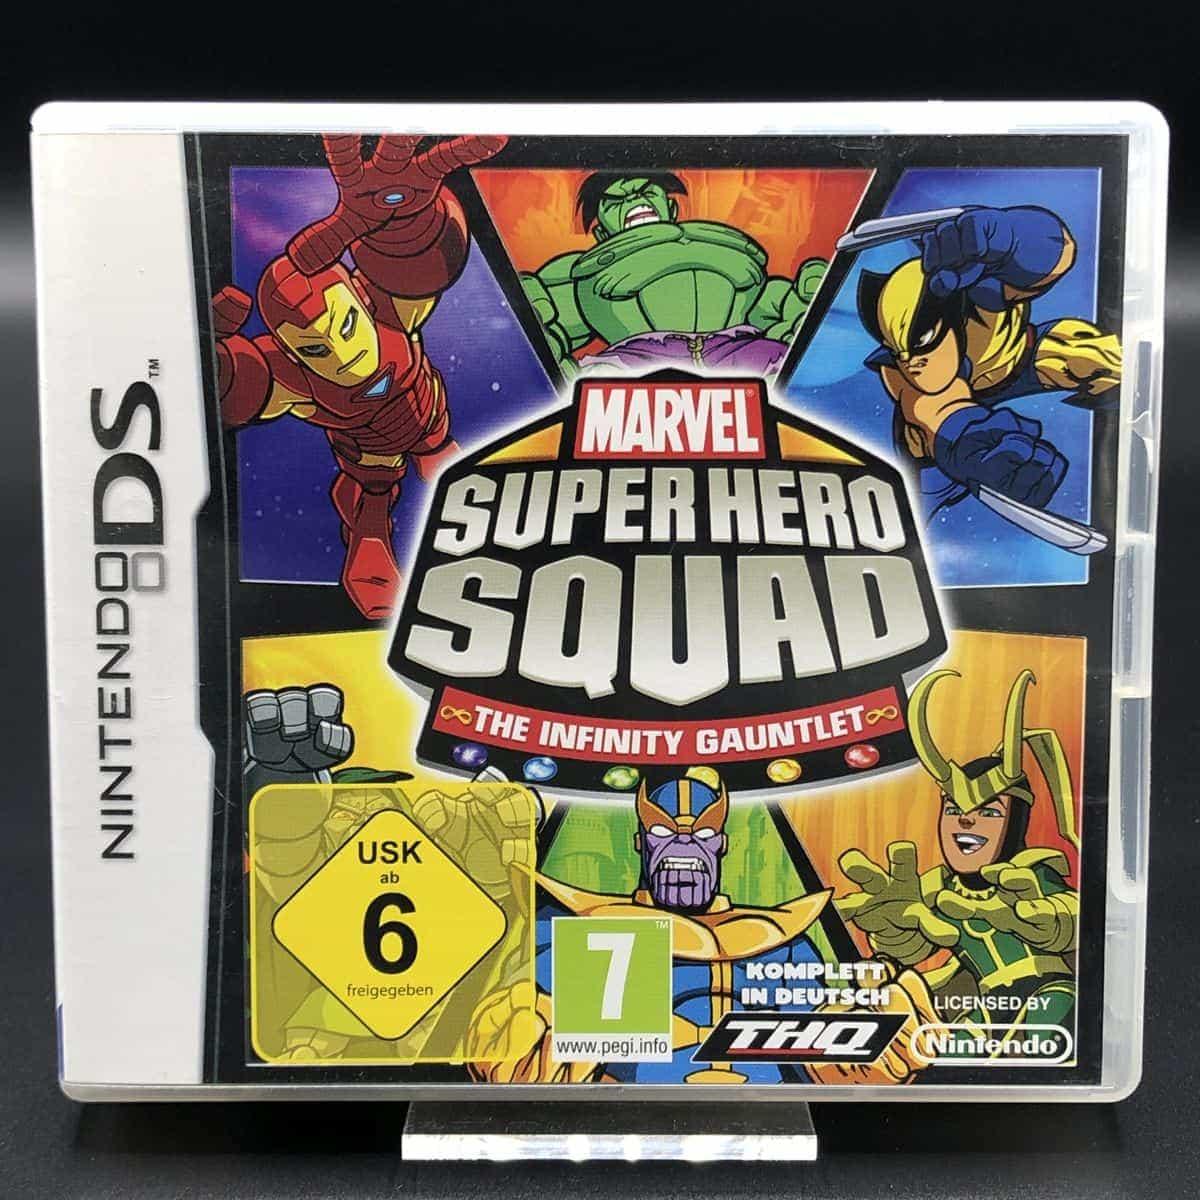 Marvel Super Hero Squad: The Infinity Gauntlet (Komplett) (Sehr gut) Nintendo DS